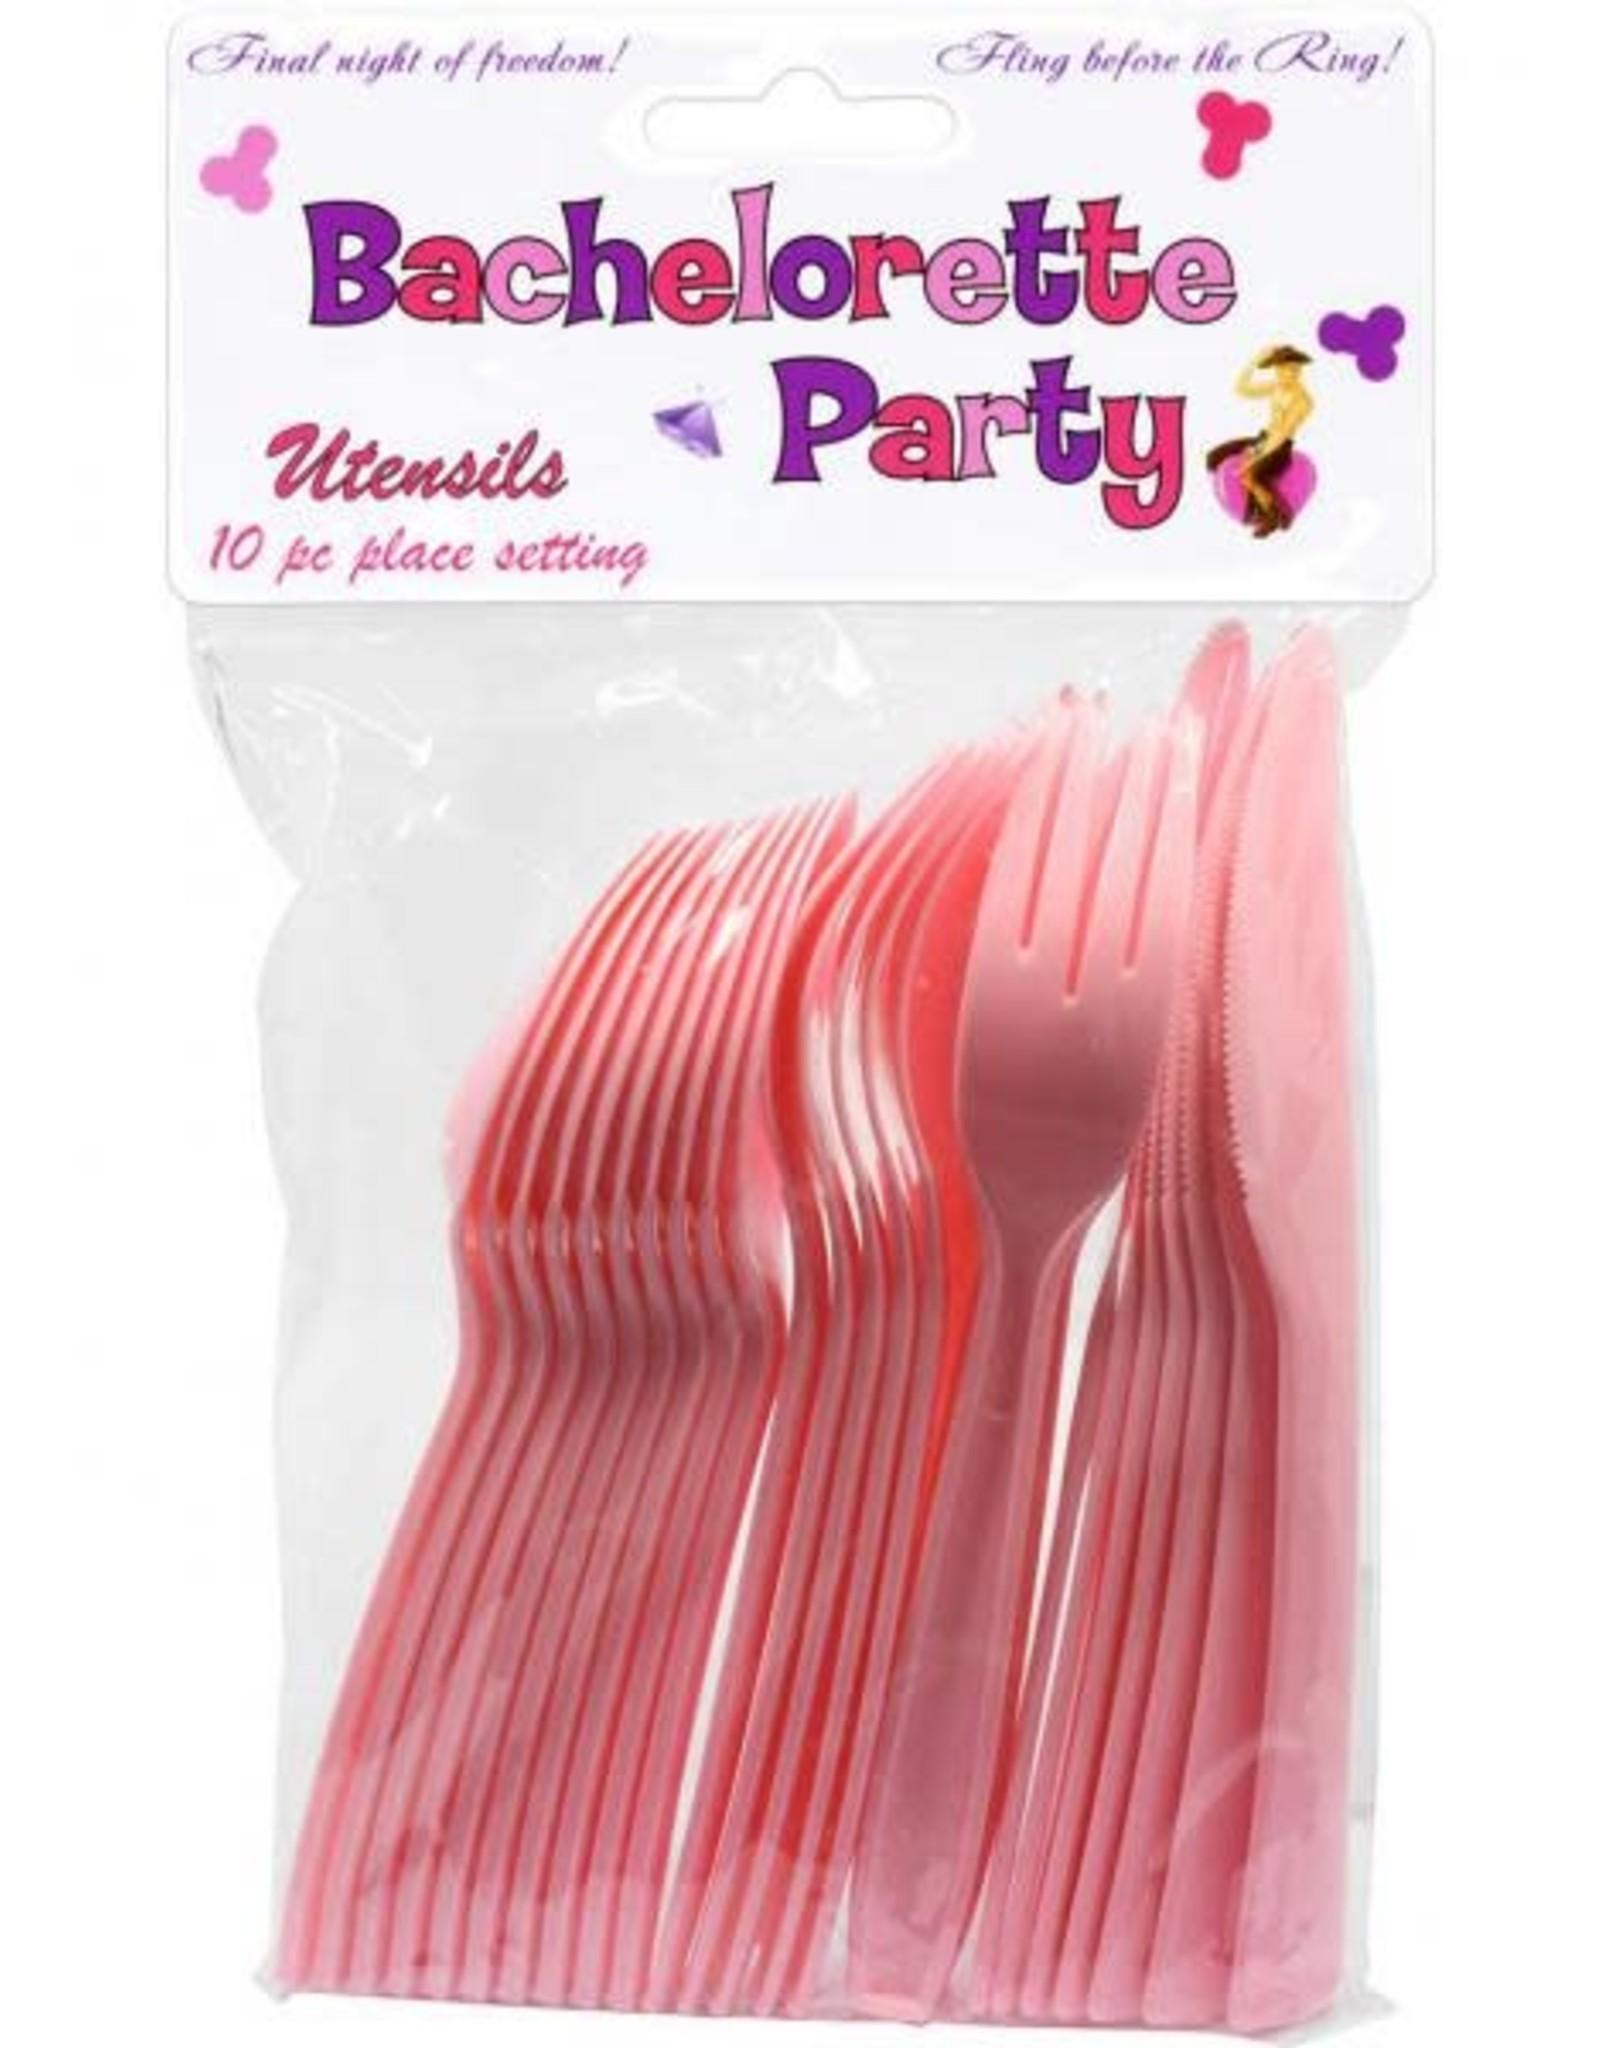 BACHELORETTE PARTY UTENSILS